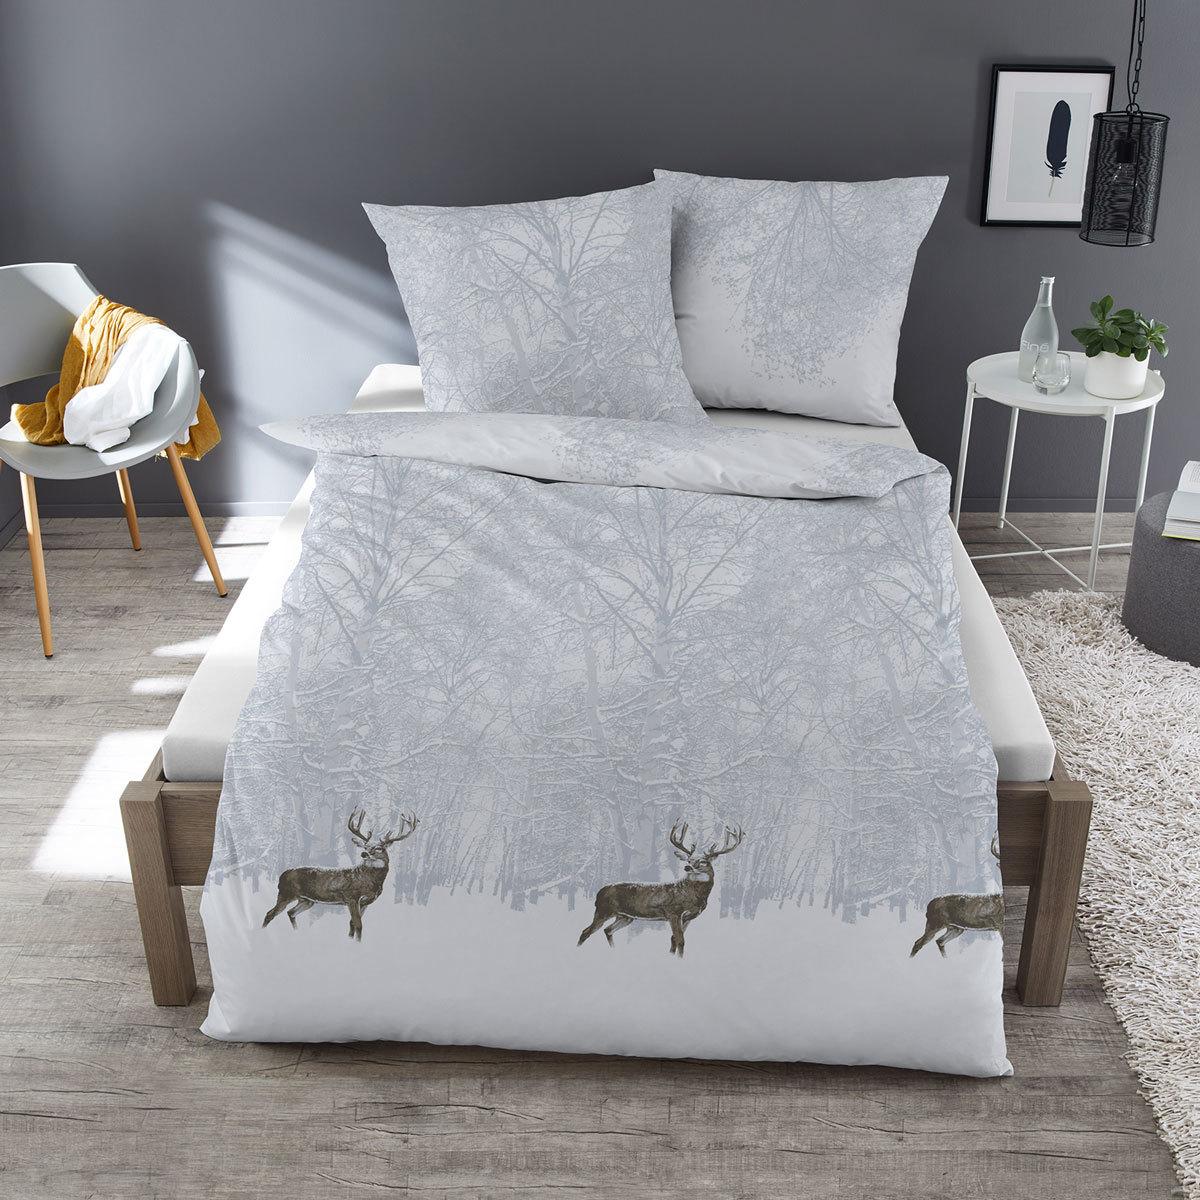 dormisette feinbiber bettw sche hirsch wei g nstig online. Black Bedroom Furniture Sets. Home Design Ideas